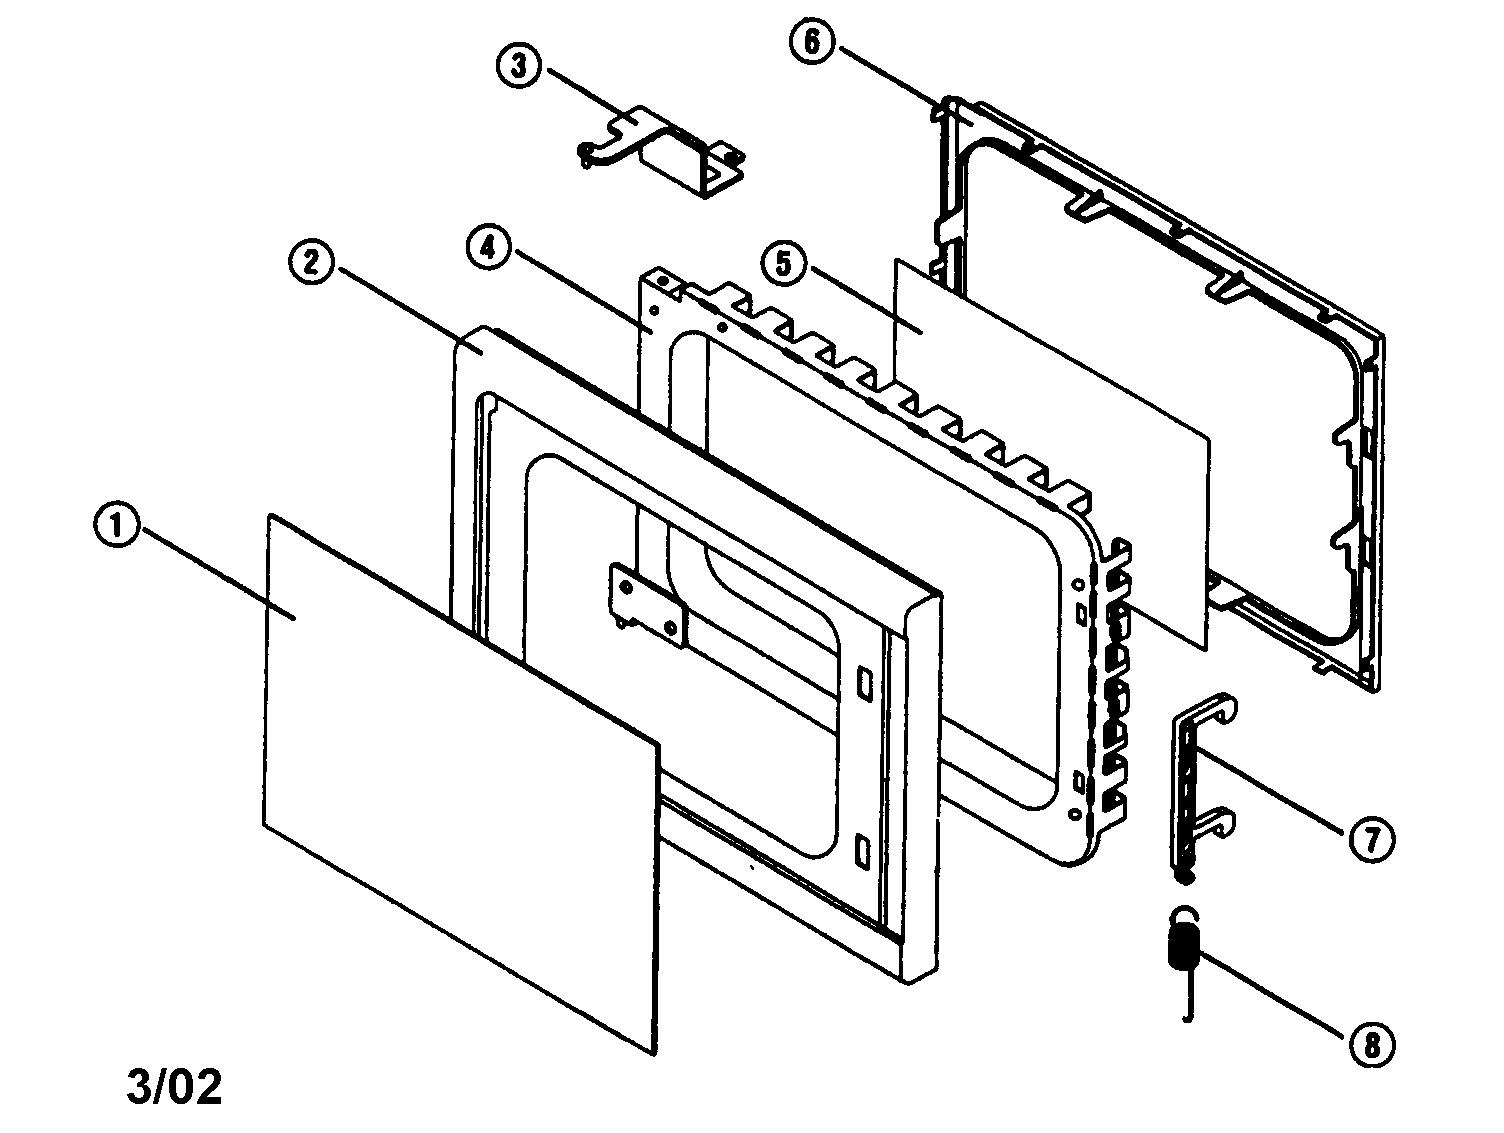 Emerson model MW8985S countertop microwave genuine parts